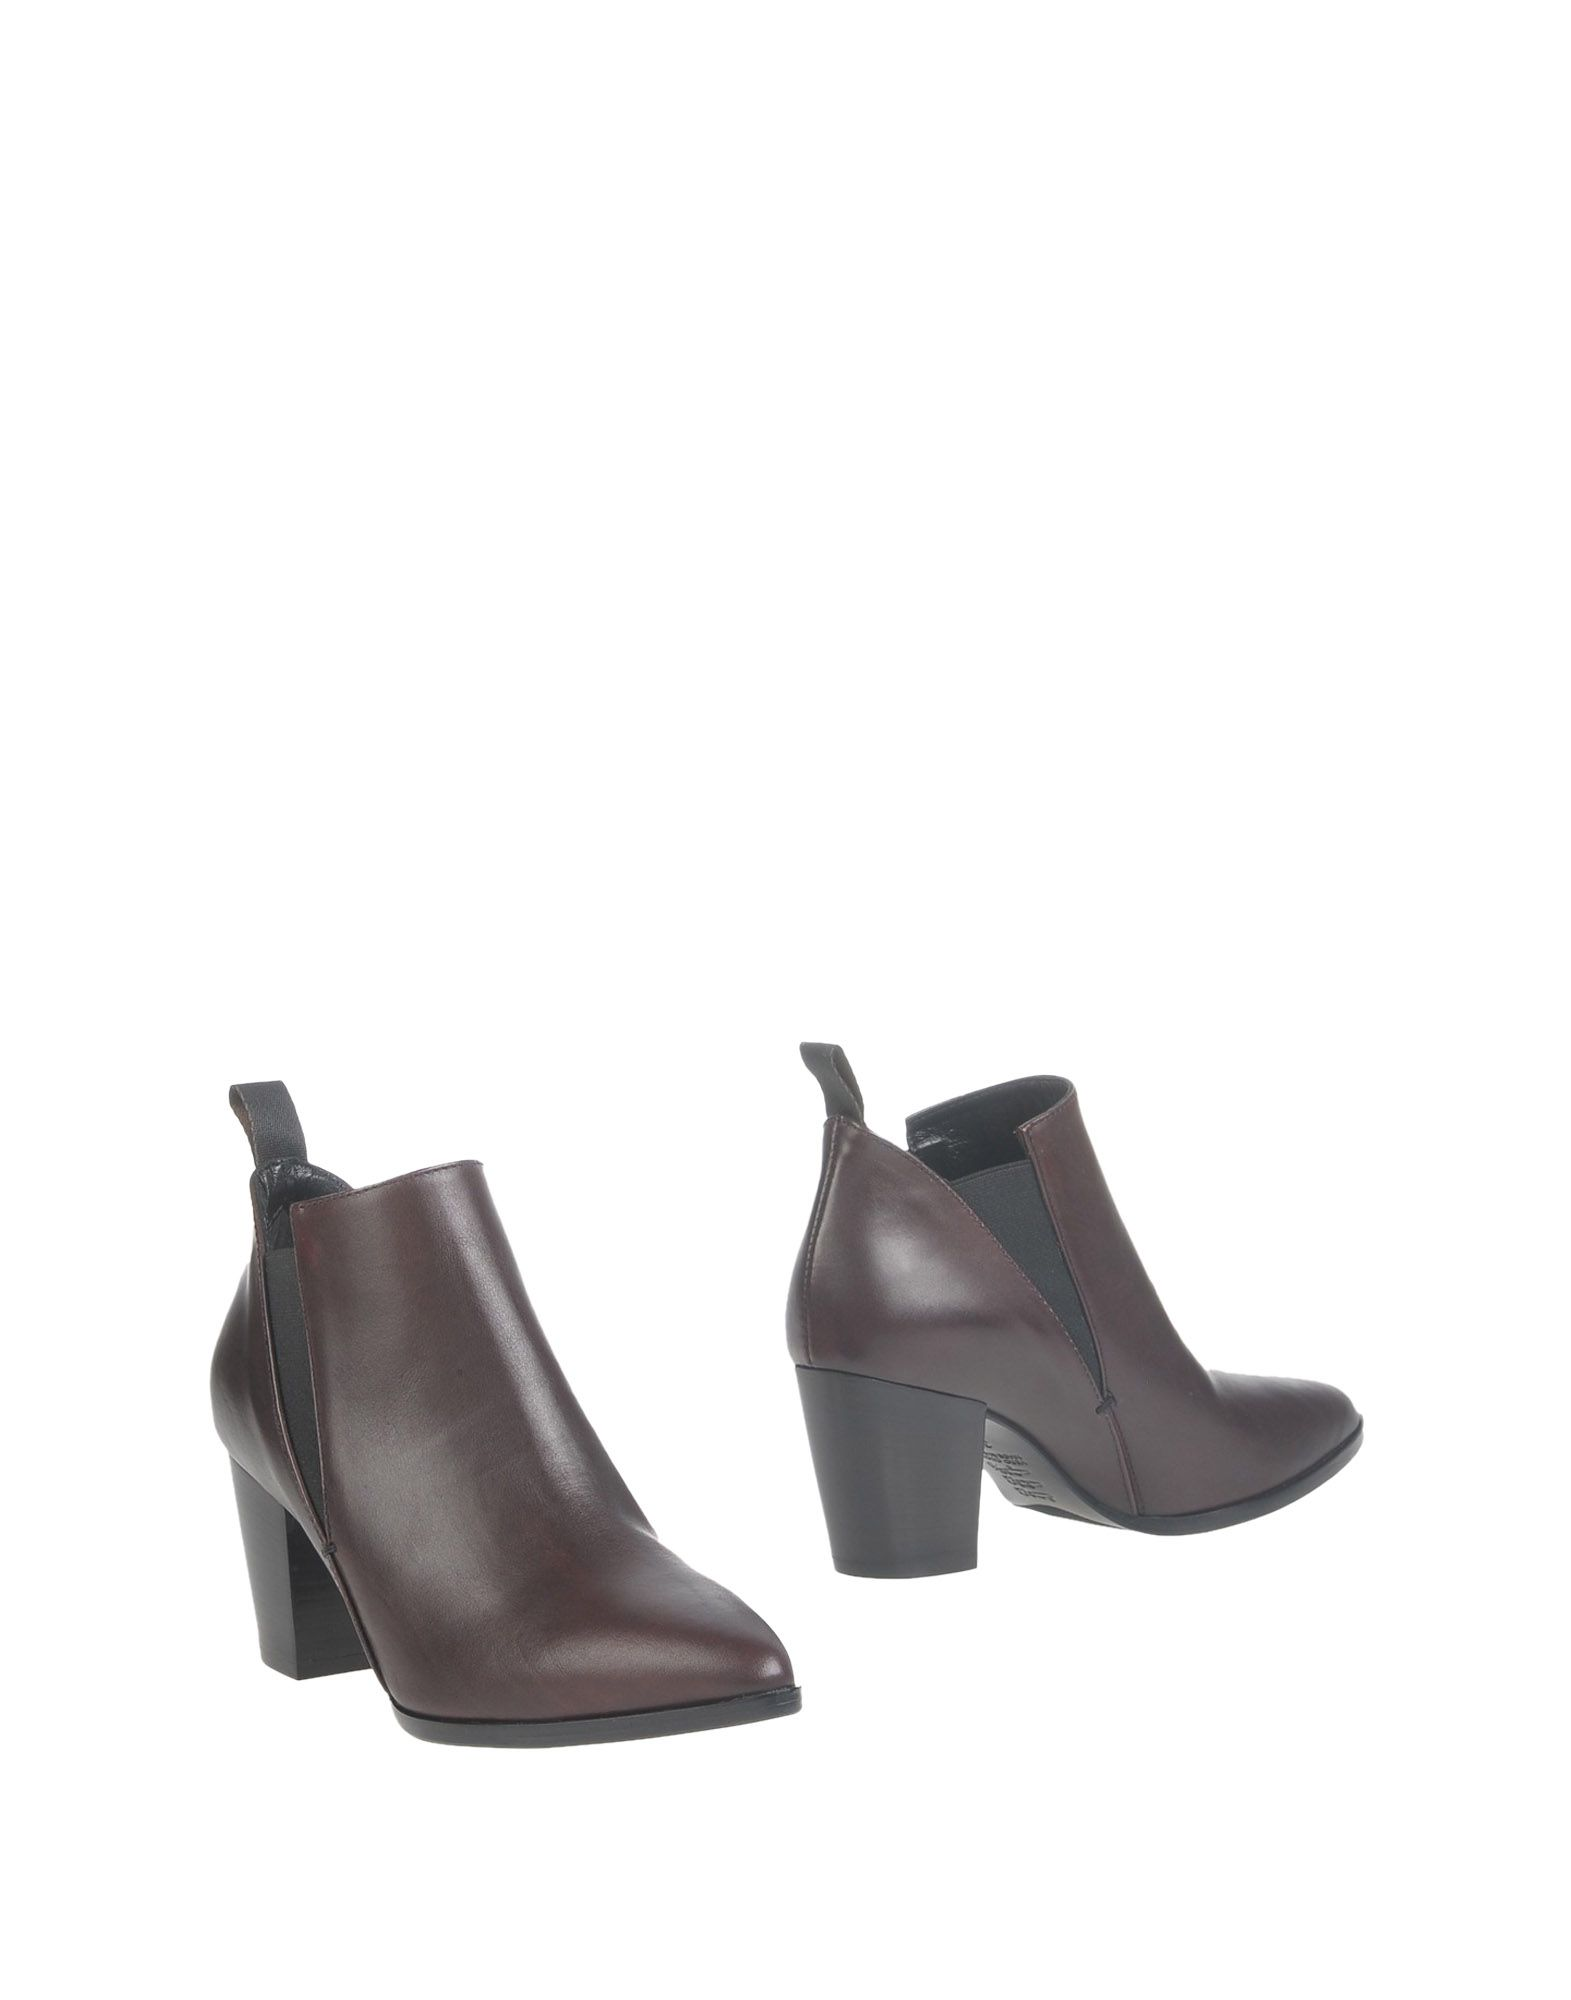 roberto botticelli luxury полусапоги и высокие ботинки ROBERTO FESTA Полусапоги и высокие ботинки